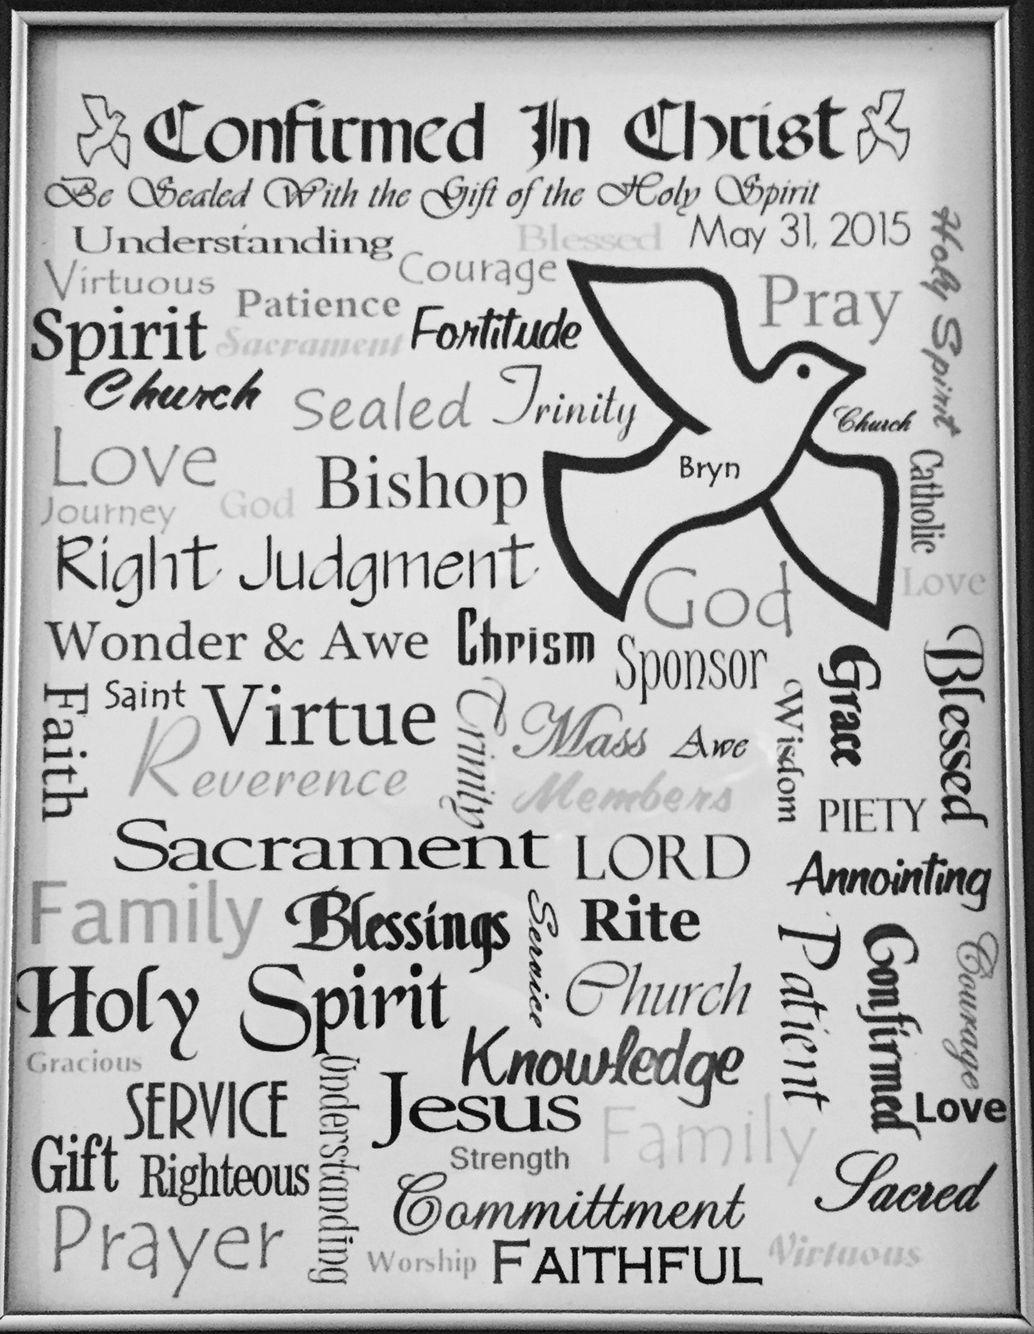 Confirmation Prayer Book Boys Confirm Mass Book Special Confirmation Gifts Boys